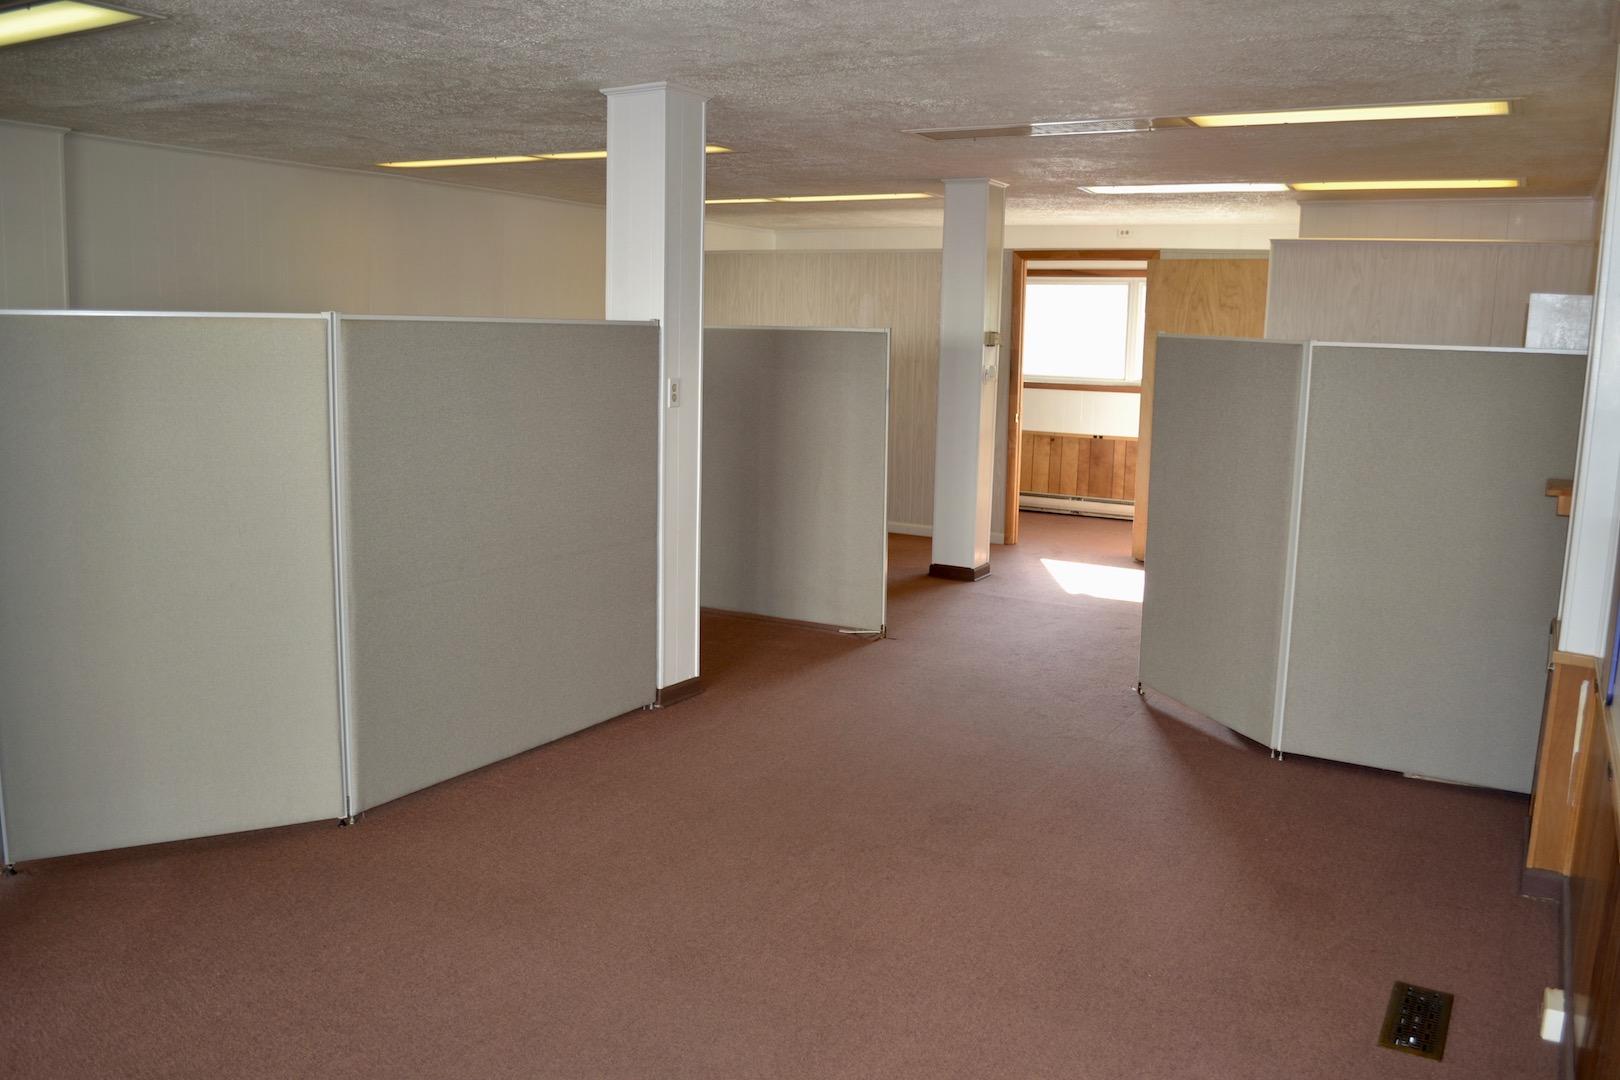 10-First Floor-Main Office Space-4.jpg